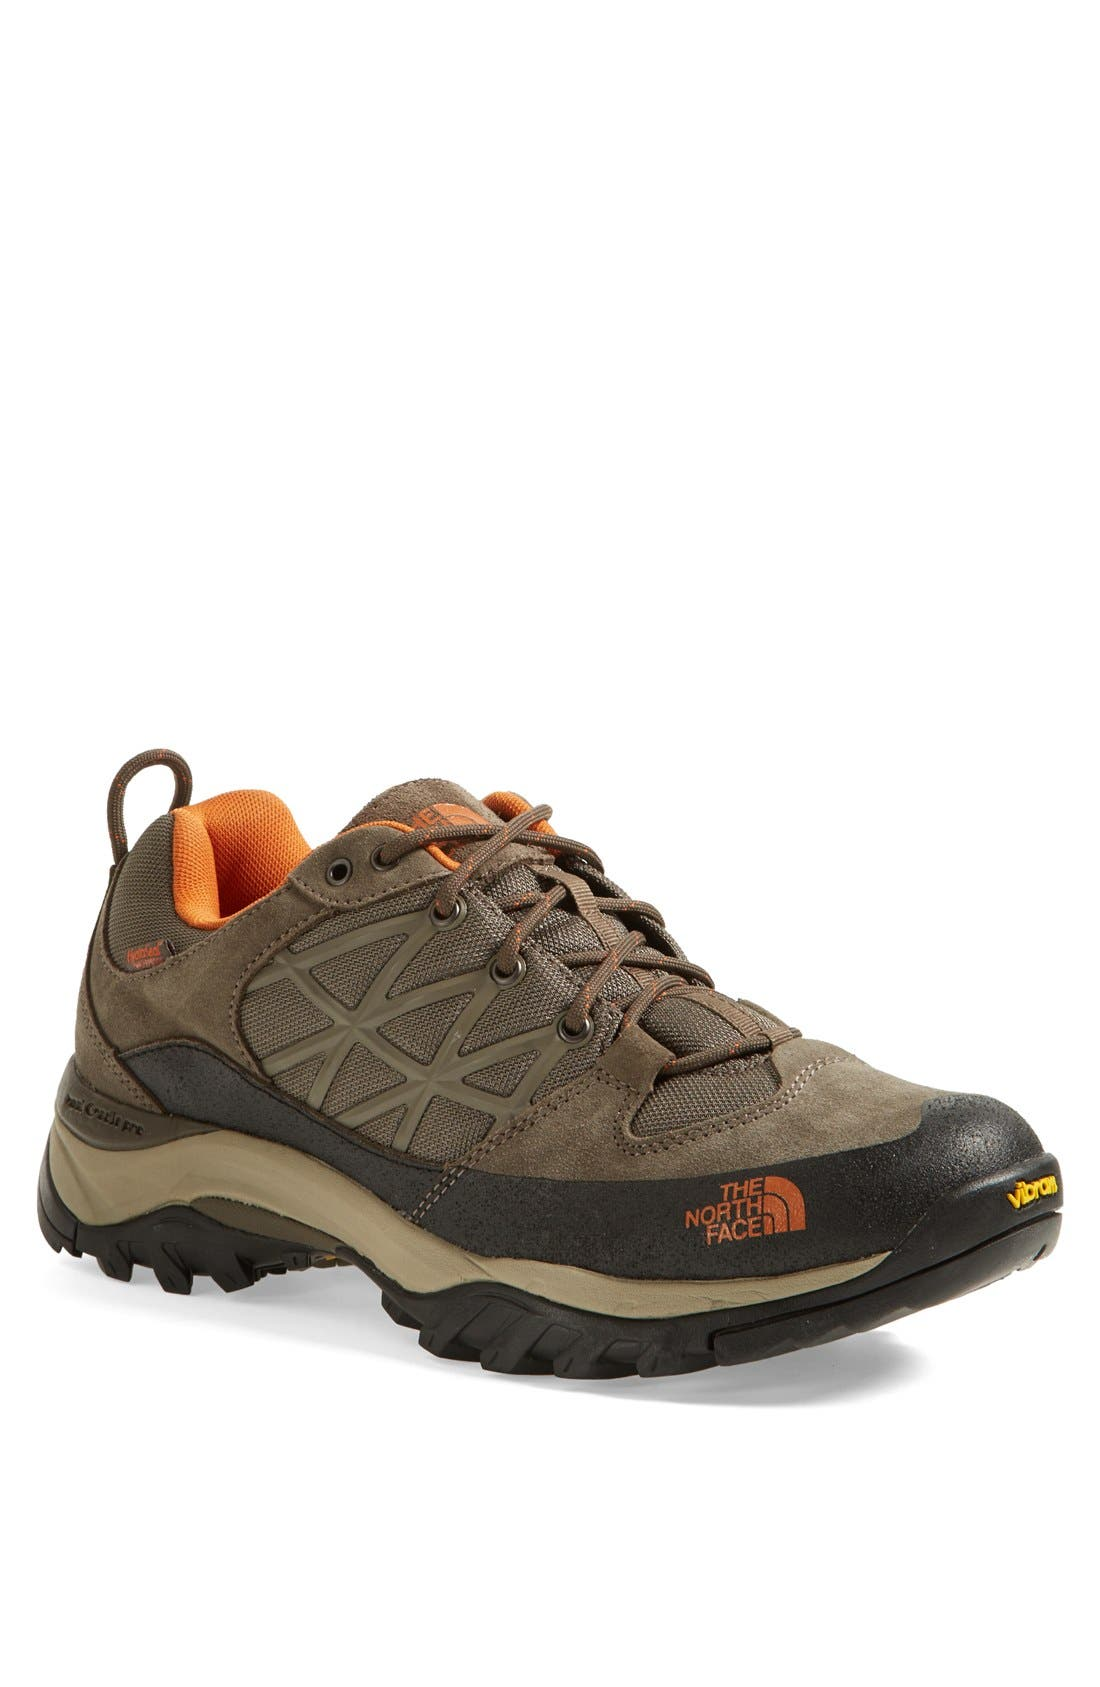 Main Image - The North Face 'Storm WP' Hiking Shoe (Men)